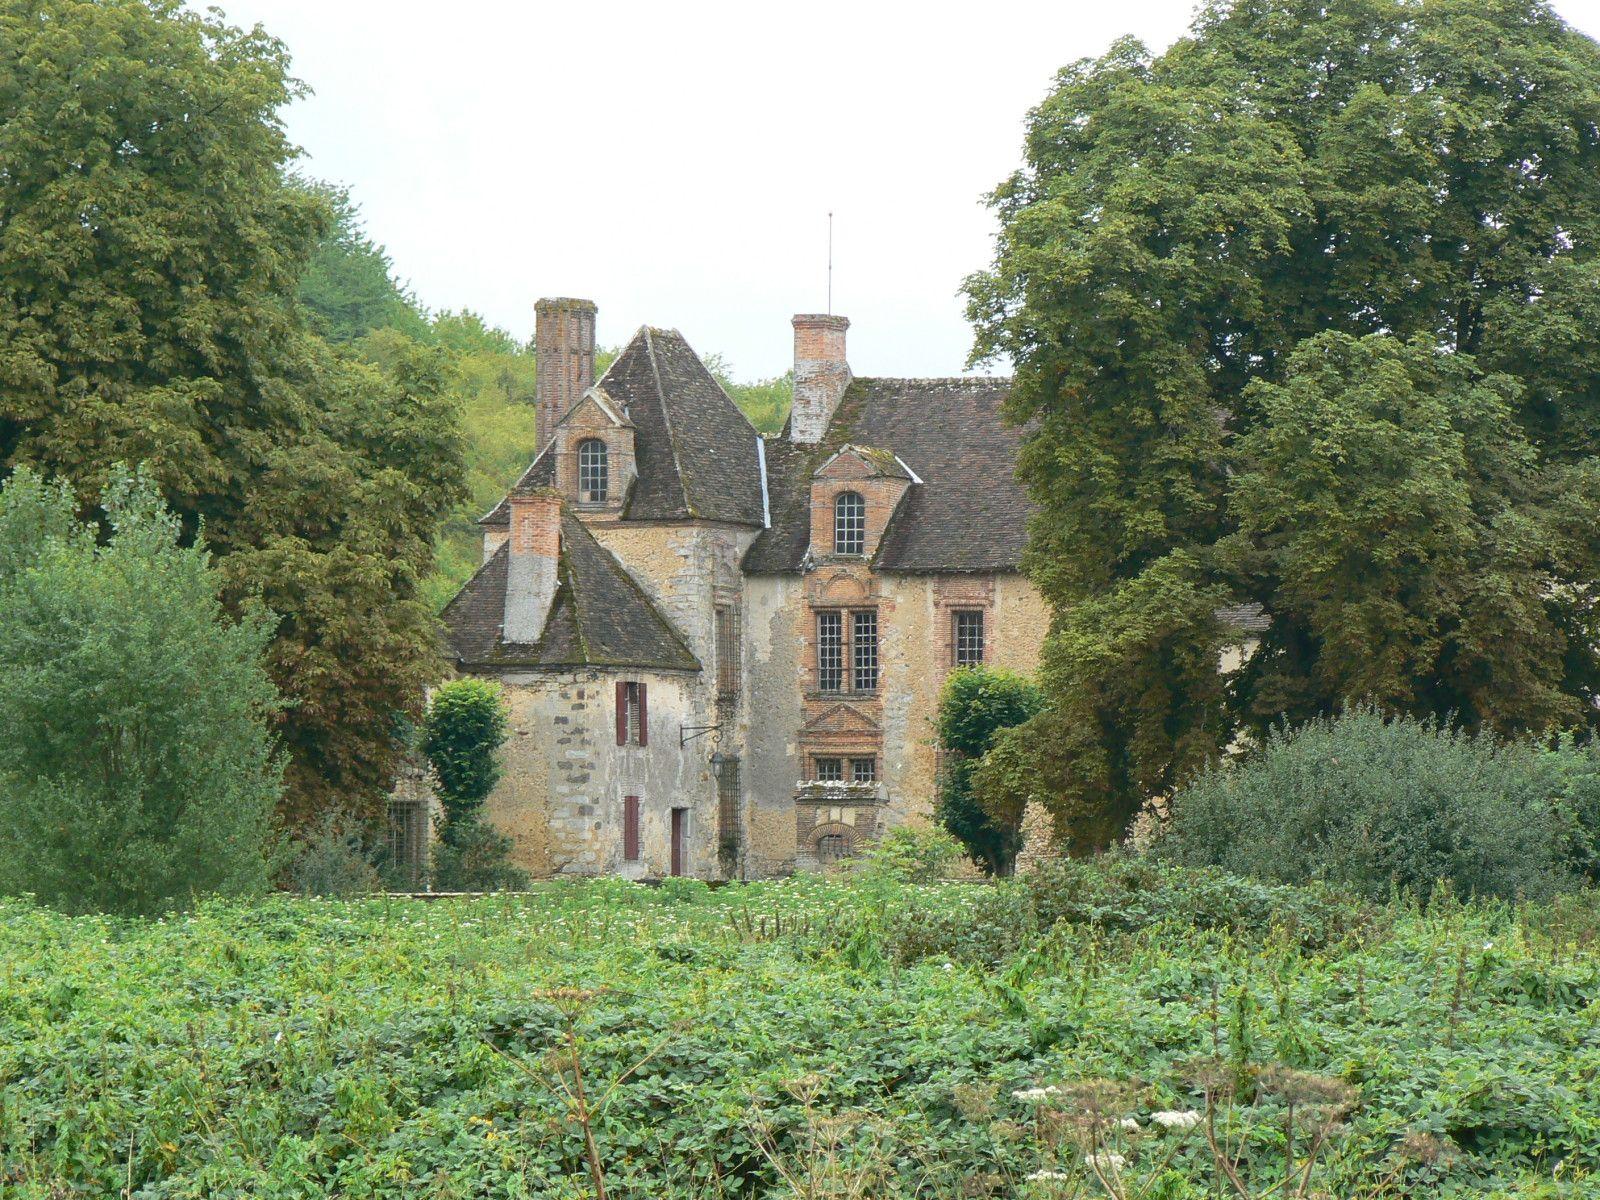 Claye Souilly Decouverte Environnement Chapelle Decouverte